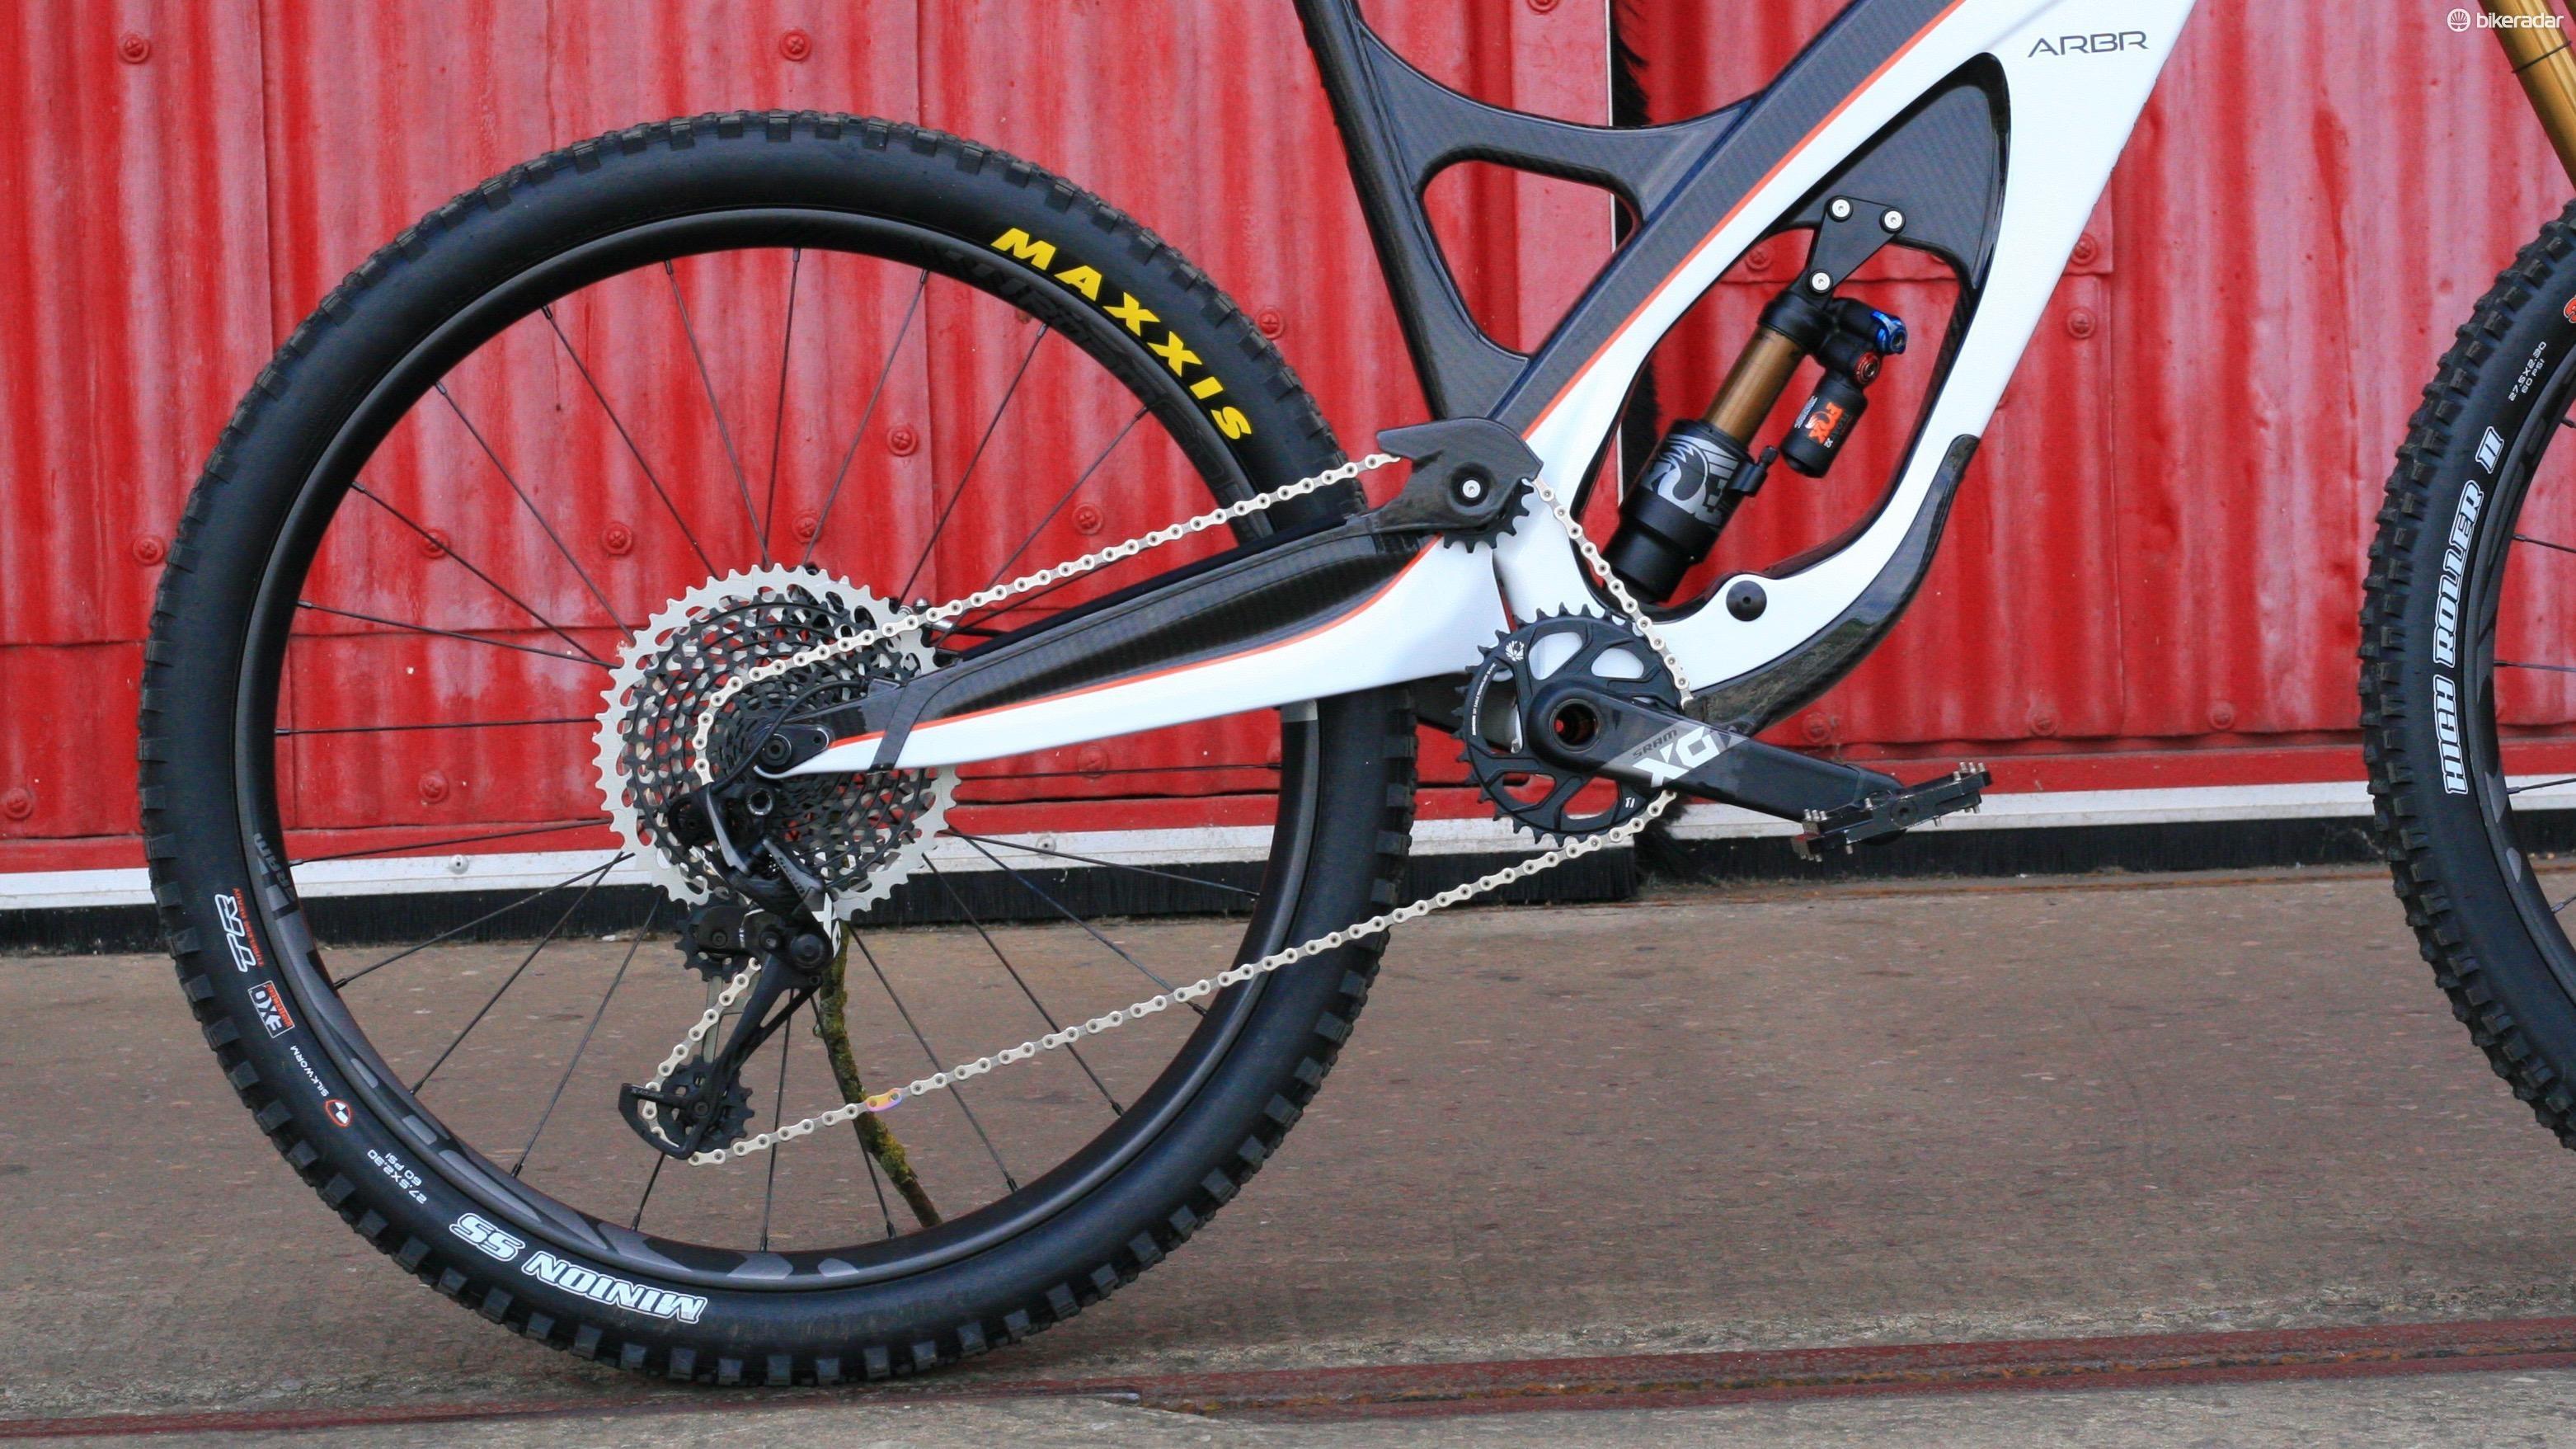 09_bikeradar_bike_of_the_future-1543408847162-au6m3jpkycuh-4dcf299